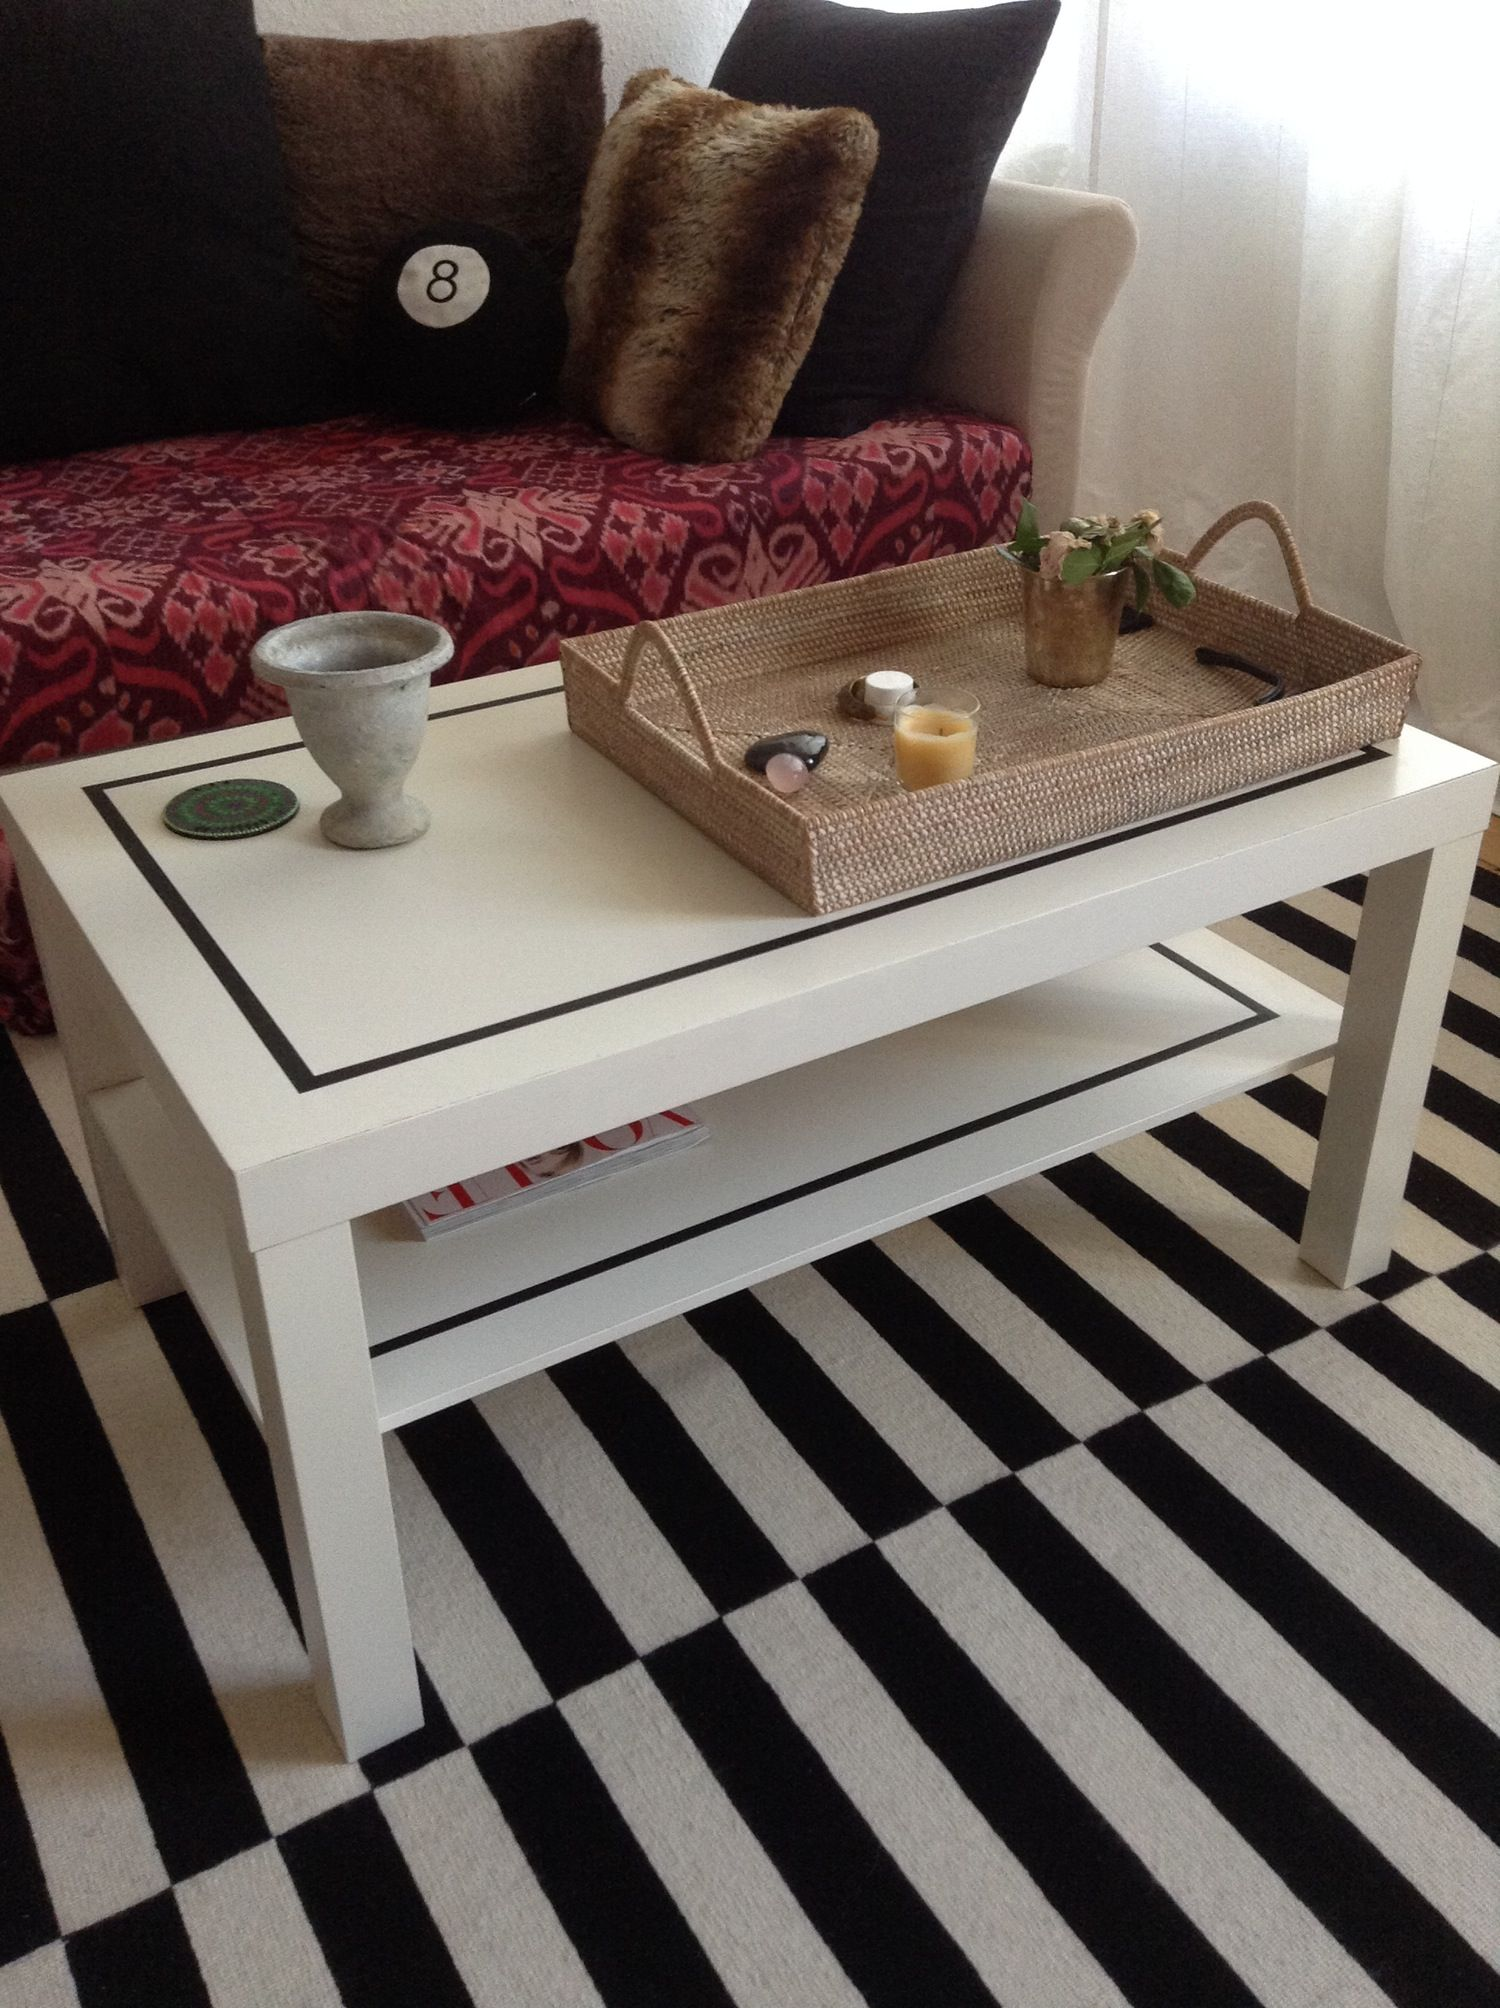 A Simple & Stylish DIY IKEA Coffee Table Upgrade Ikea